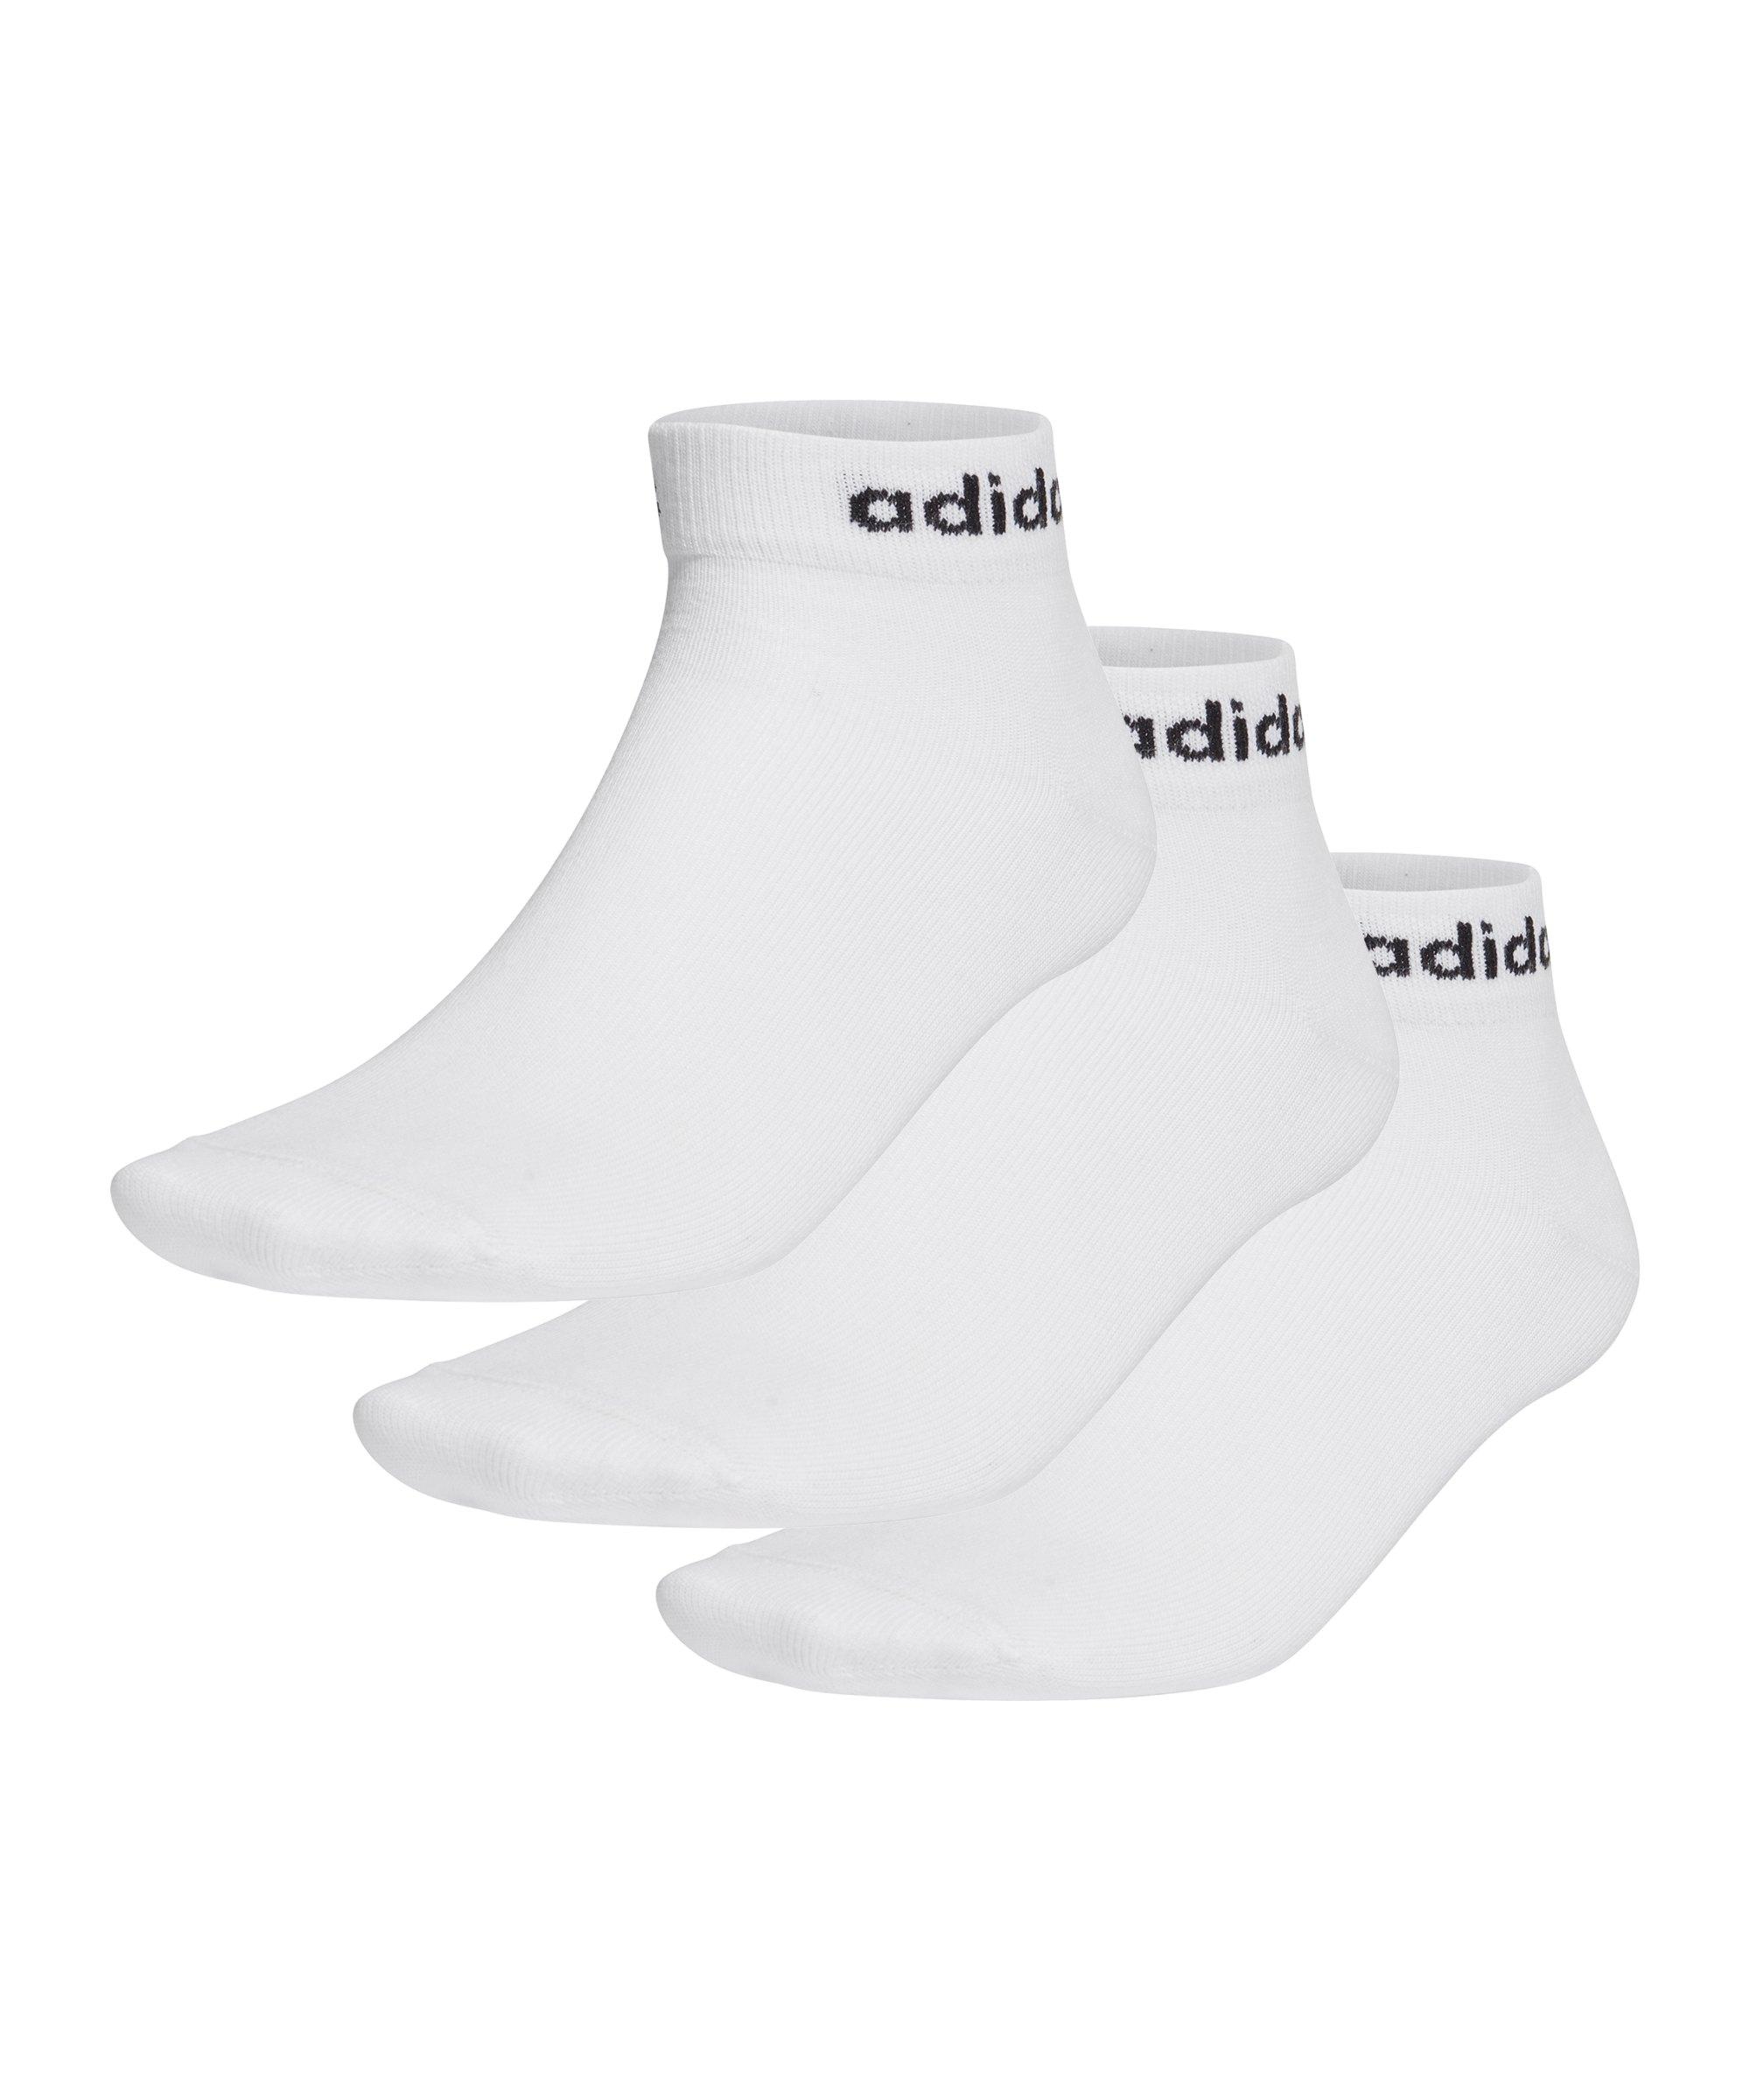 adidas Ankle Socken 3 Paar Weiss Schwarz - weiss